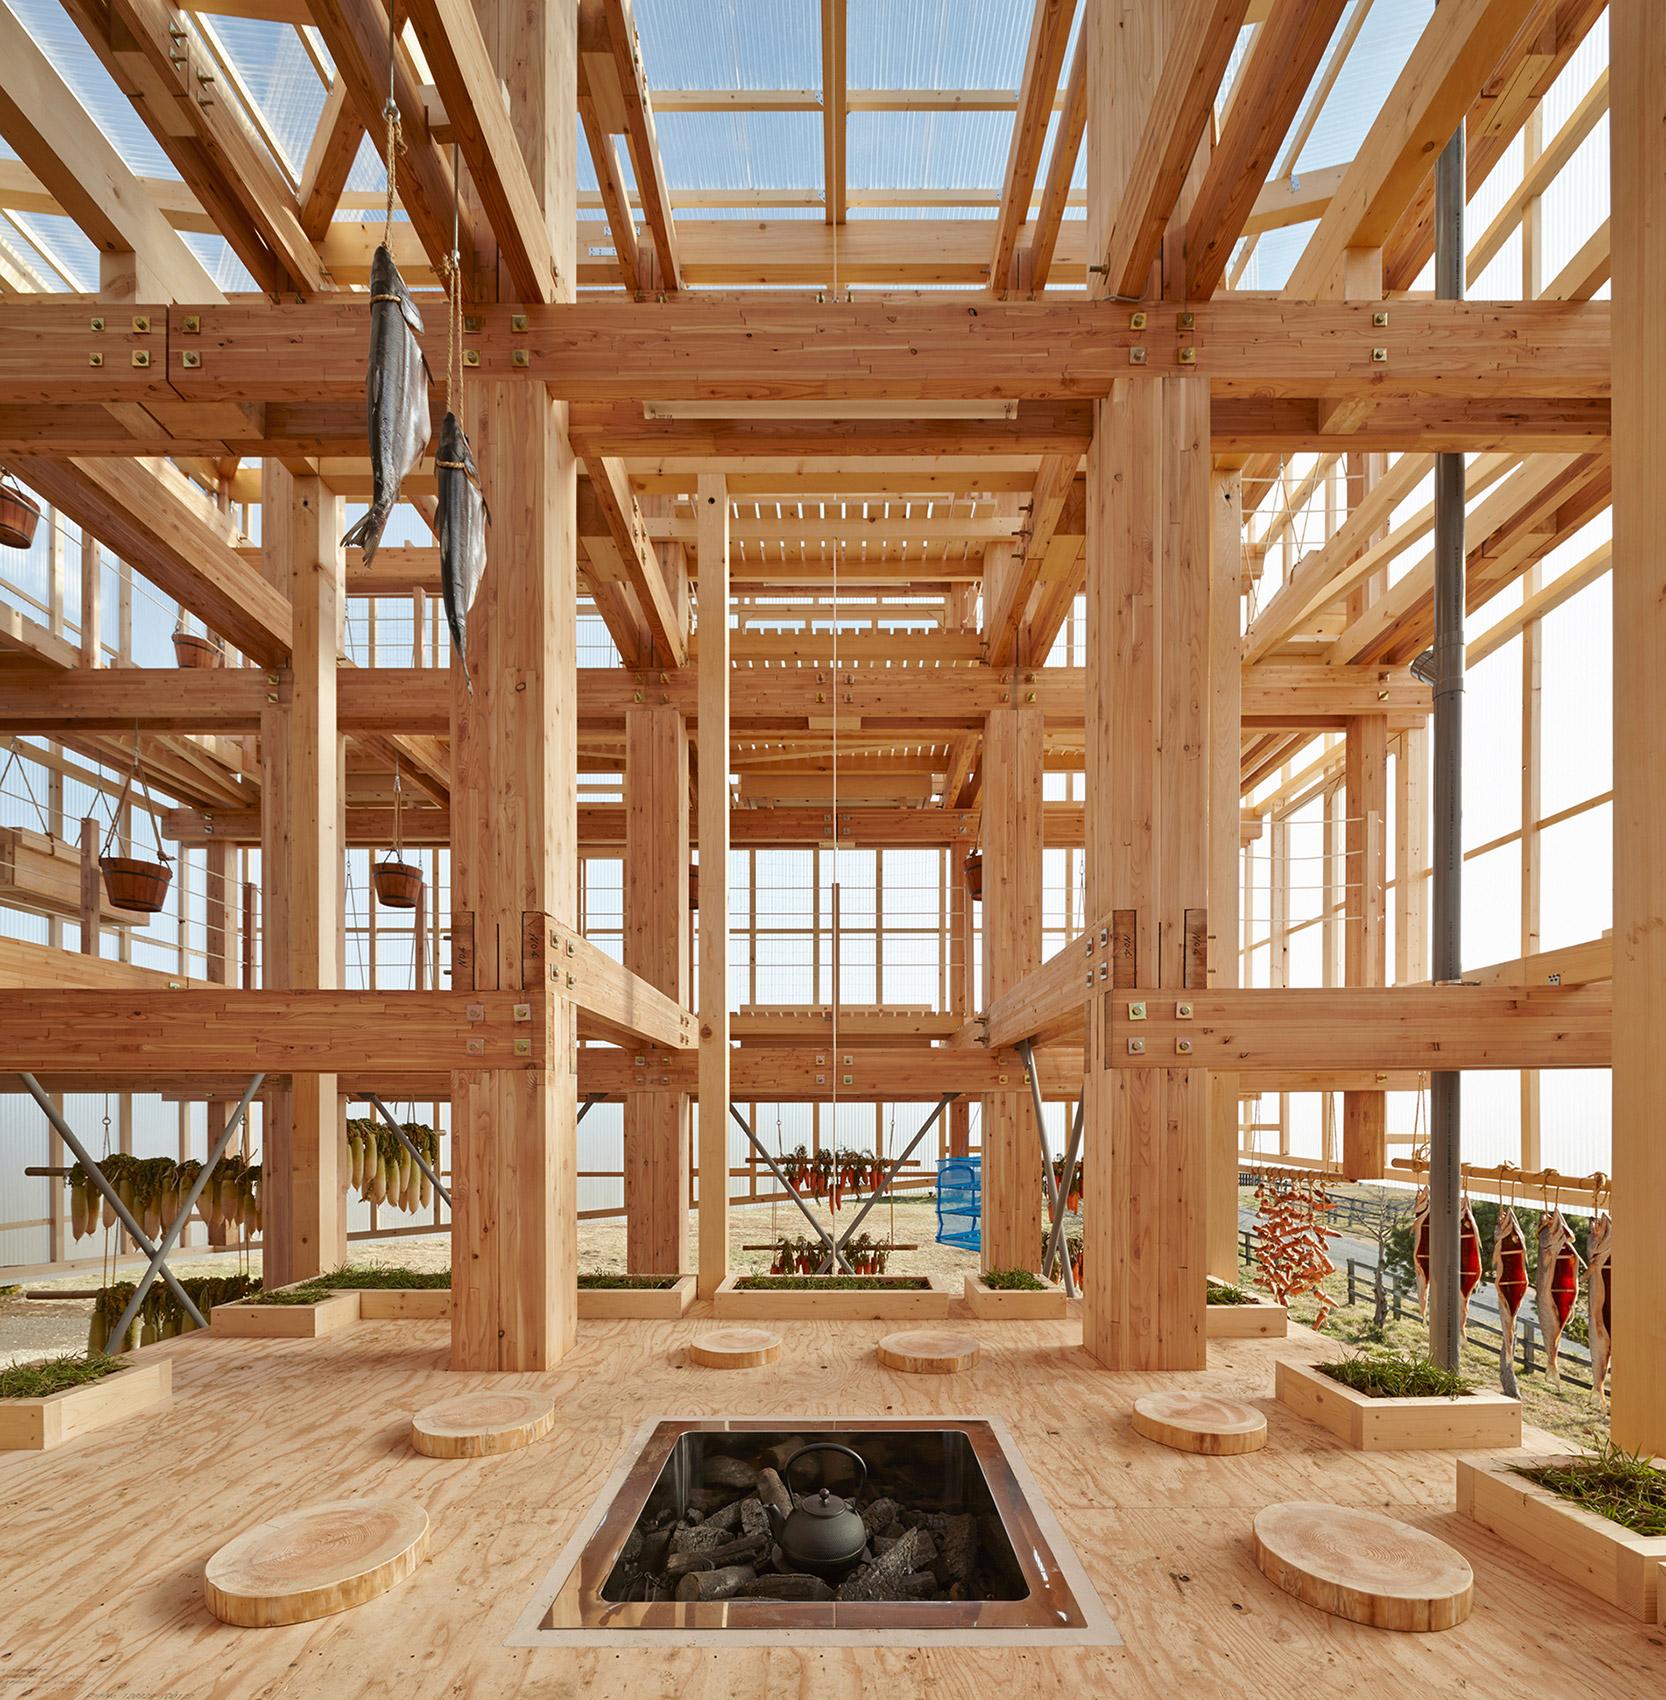 Nest We Grow / College of Environmental Design & Kengo Kuma & Associates (37)